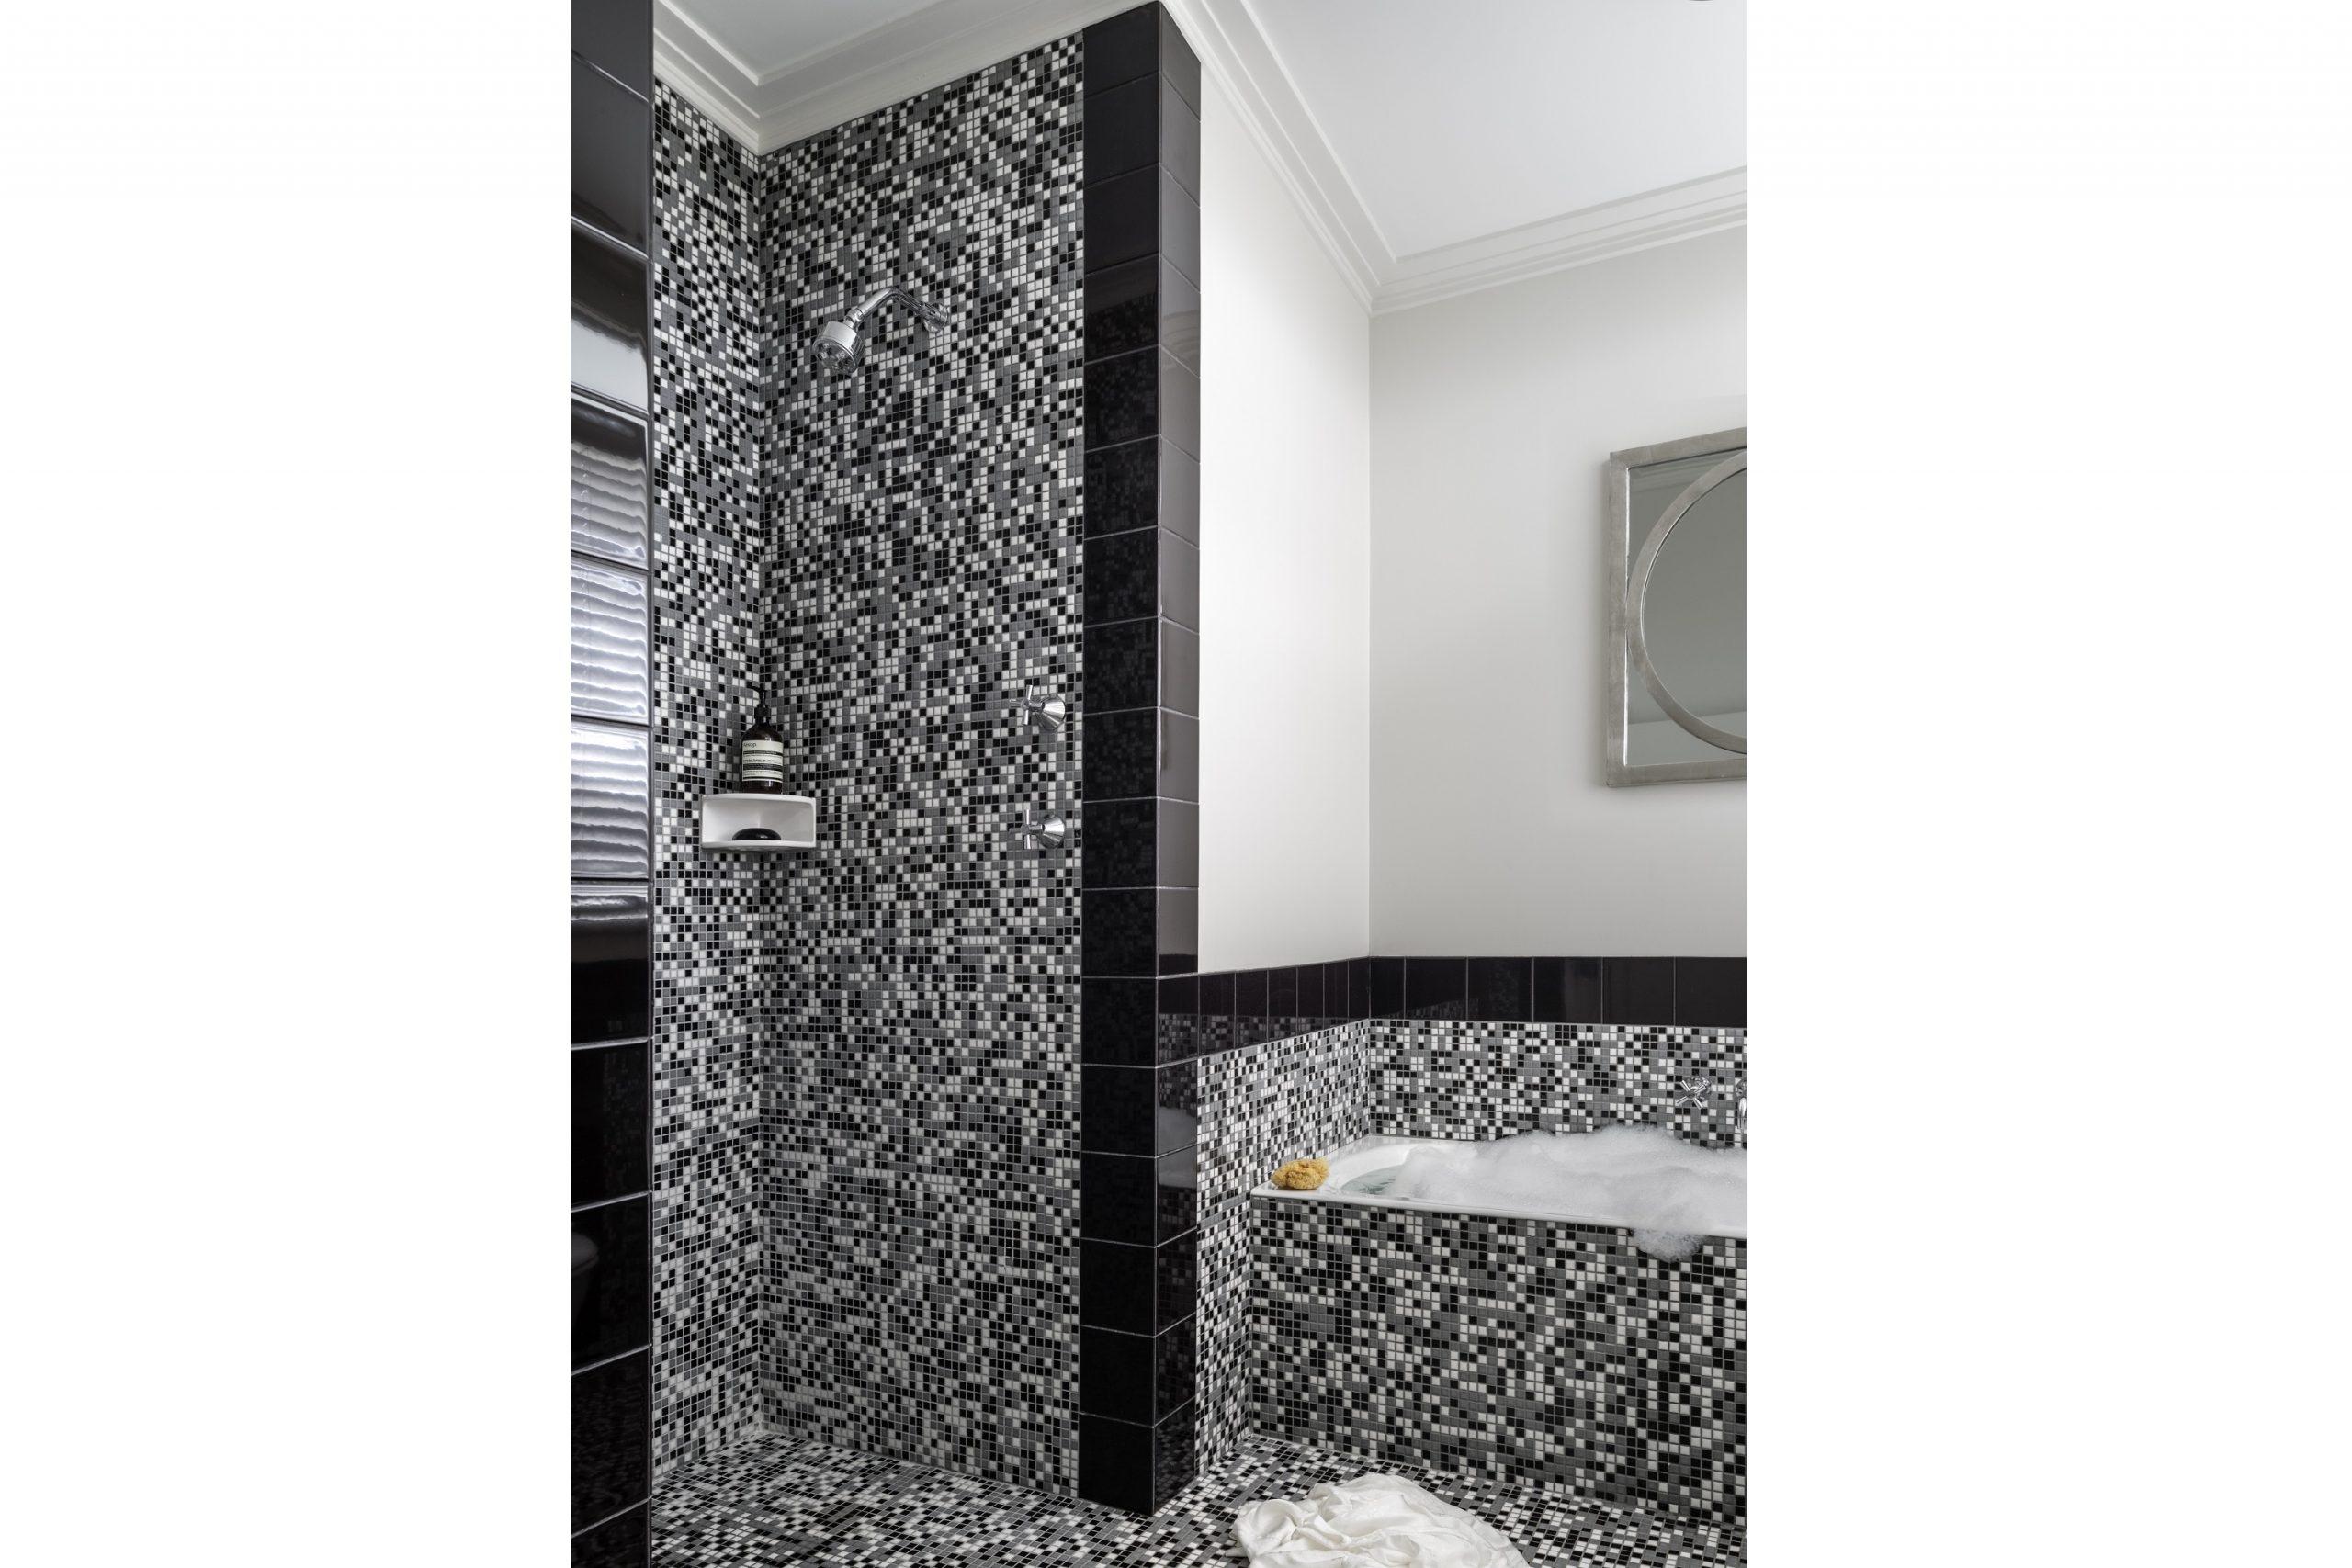 Retro-Interior-Design-1970s-Bathroom-Renovation-Kiama-Michael-Bell-Architects-Sydney